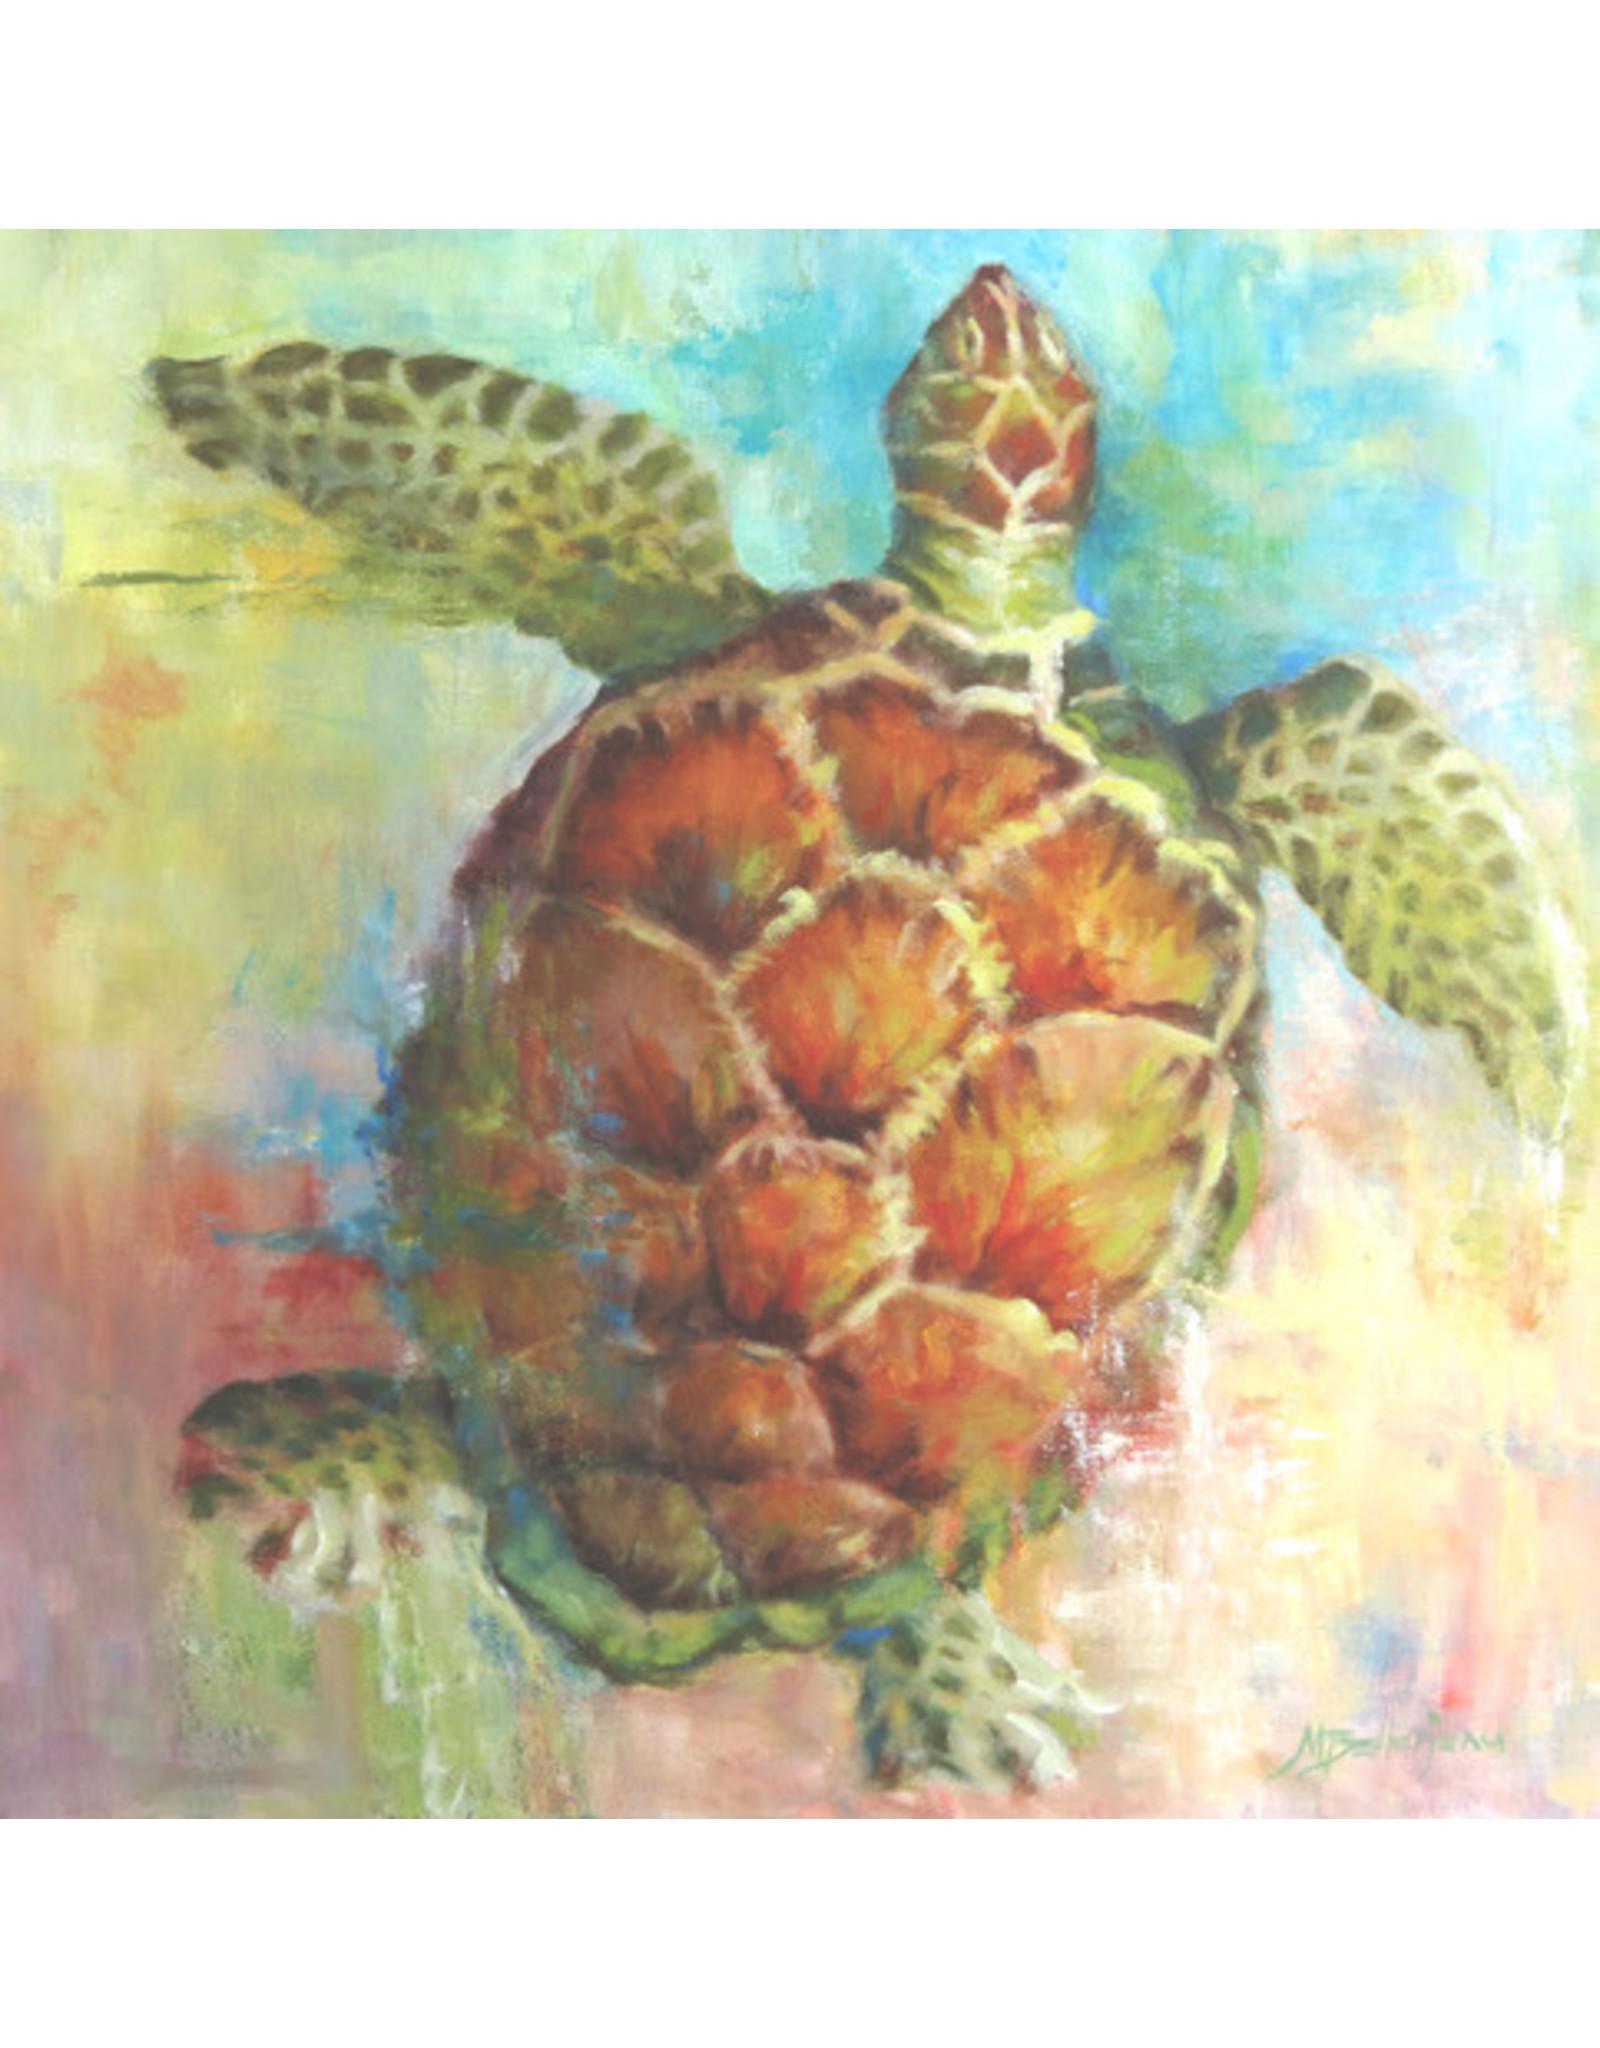 "Michaelann Bellerjeau CARIBBEAN CALICO. turtle, archival giclee on GW canvas, 16x16"" MICB"